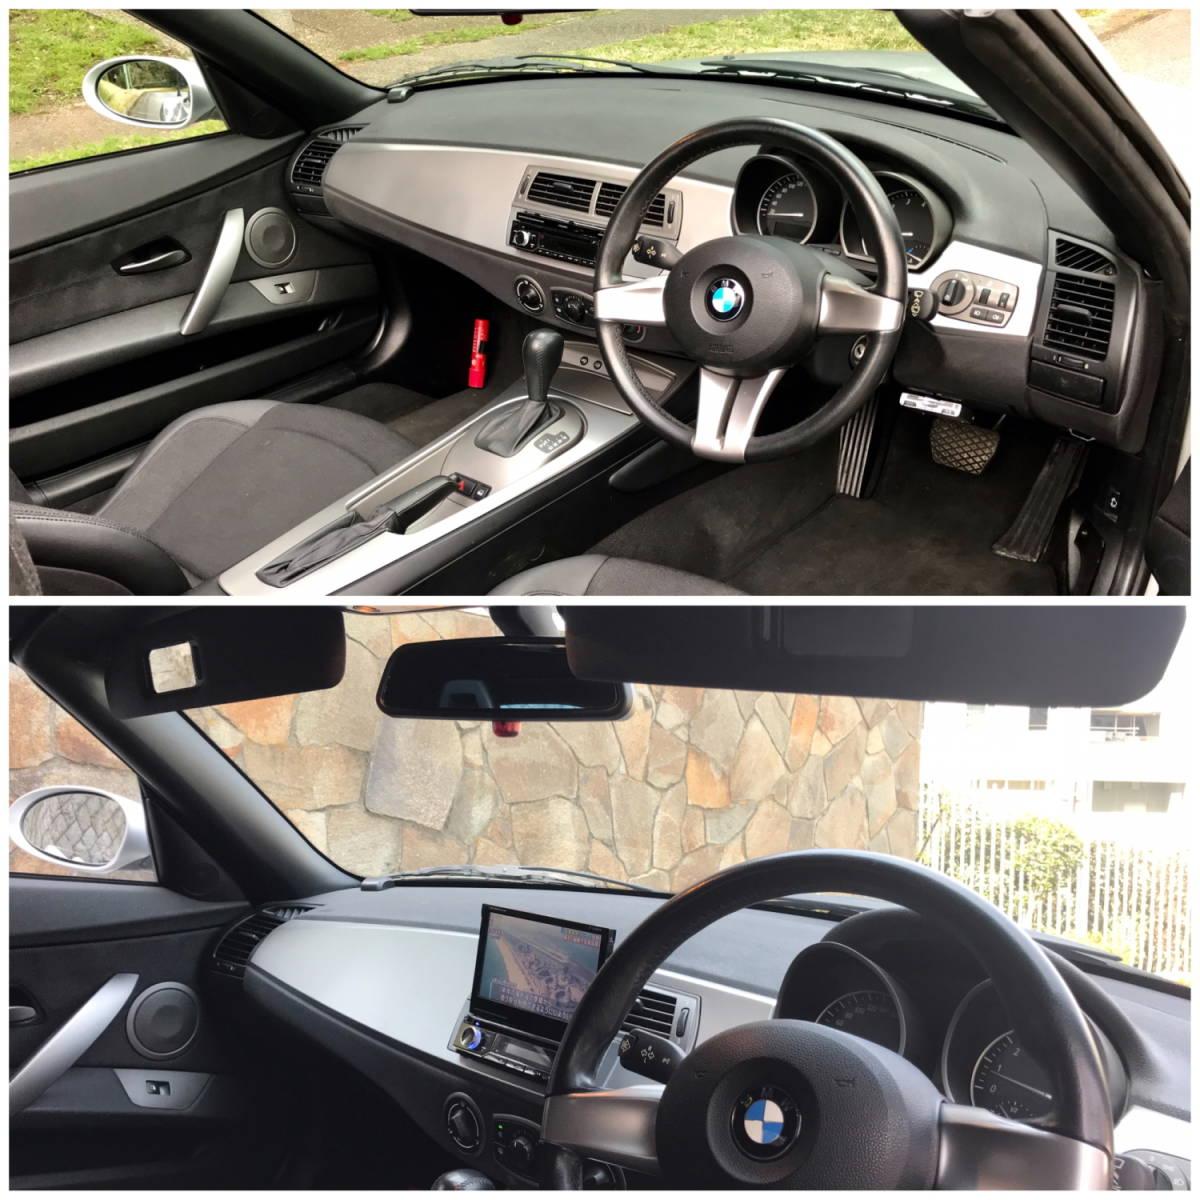 BMW Z4 2.2i 【低走行47.810 km!掘り出し物】これからの季節に最高!直列6気筒DOHC170psのシルキーシックス!ナビ/地デジ/ETC、程度抜群!_画像9